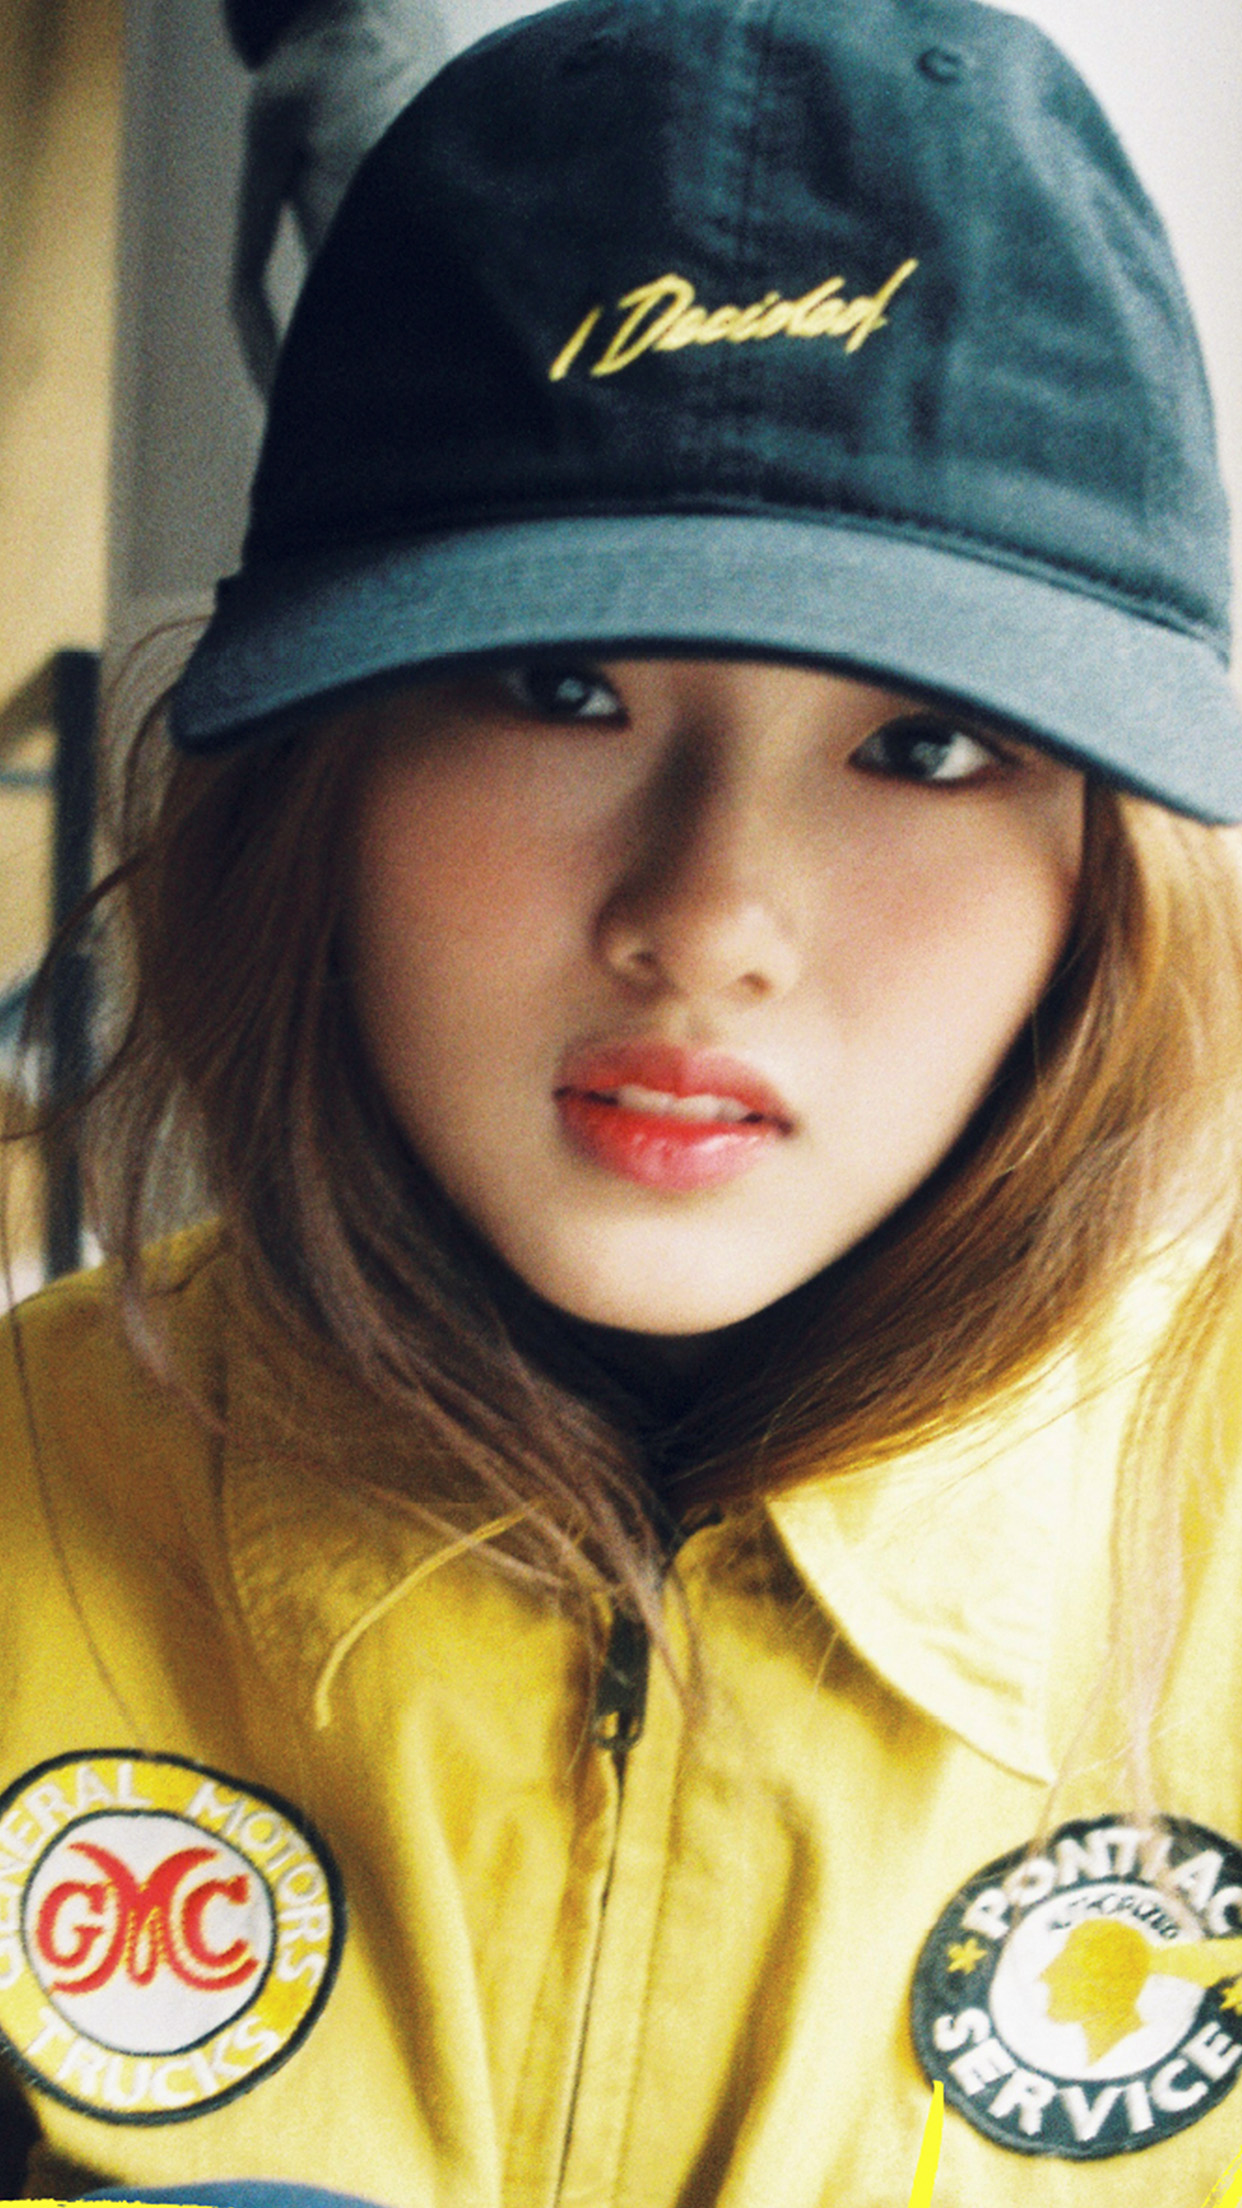 Cute Small Girl Hd Wallpaper Hp58 Girl Hat Cute Kpop Wallpaper